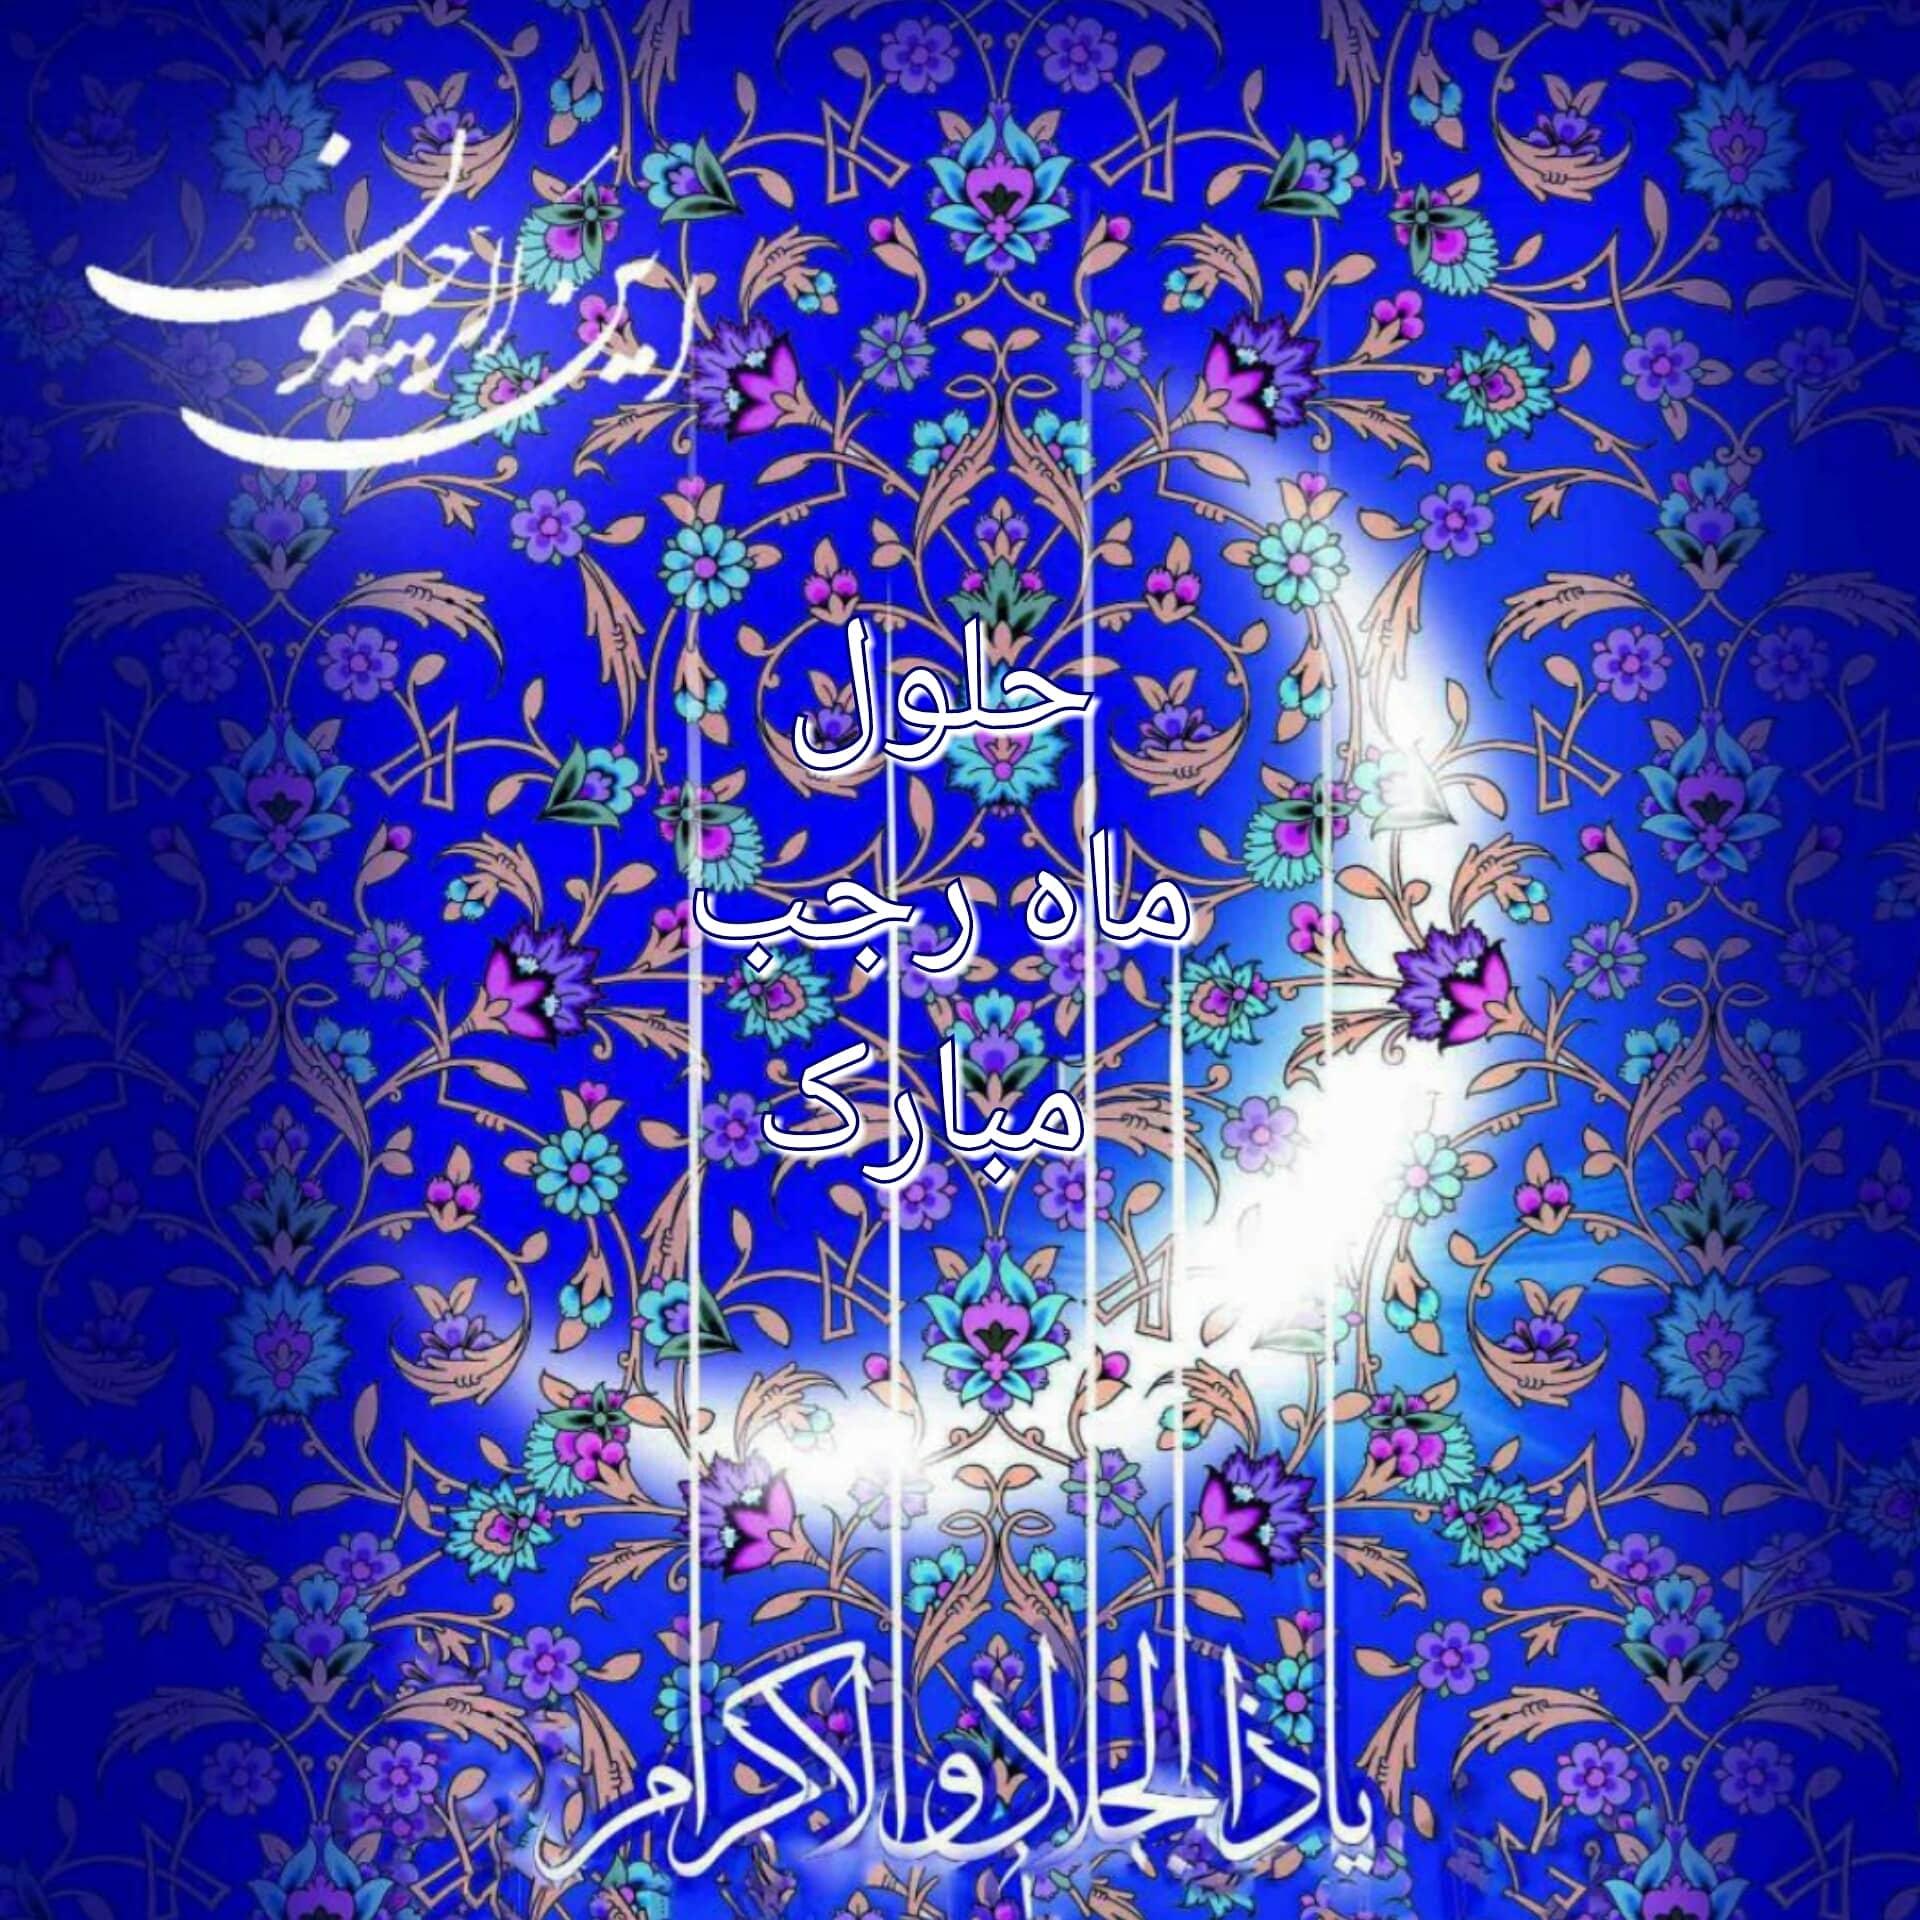 zekre rajab 3 - ذكرهای ماه رجب